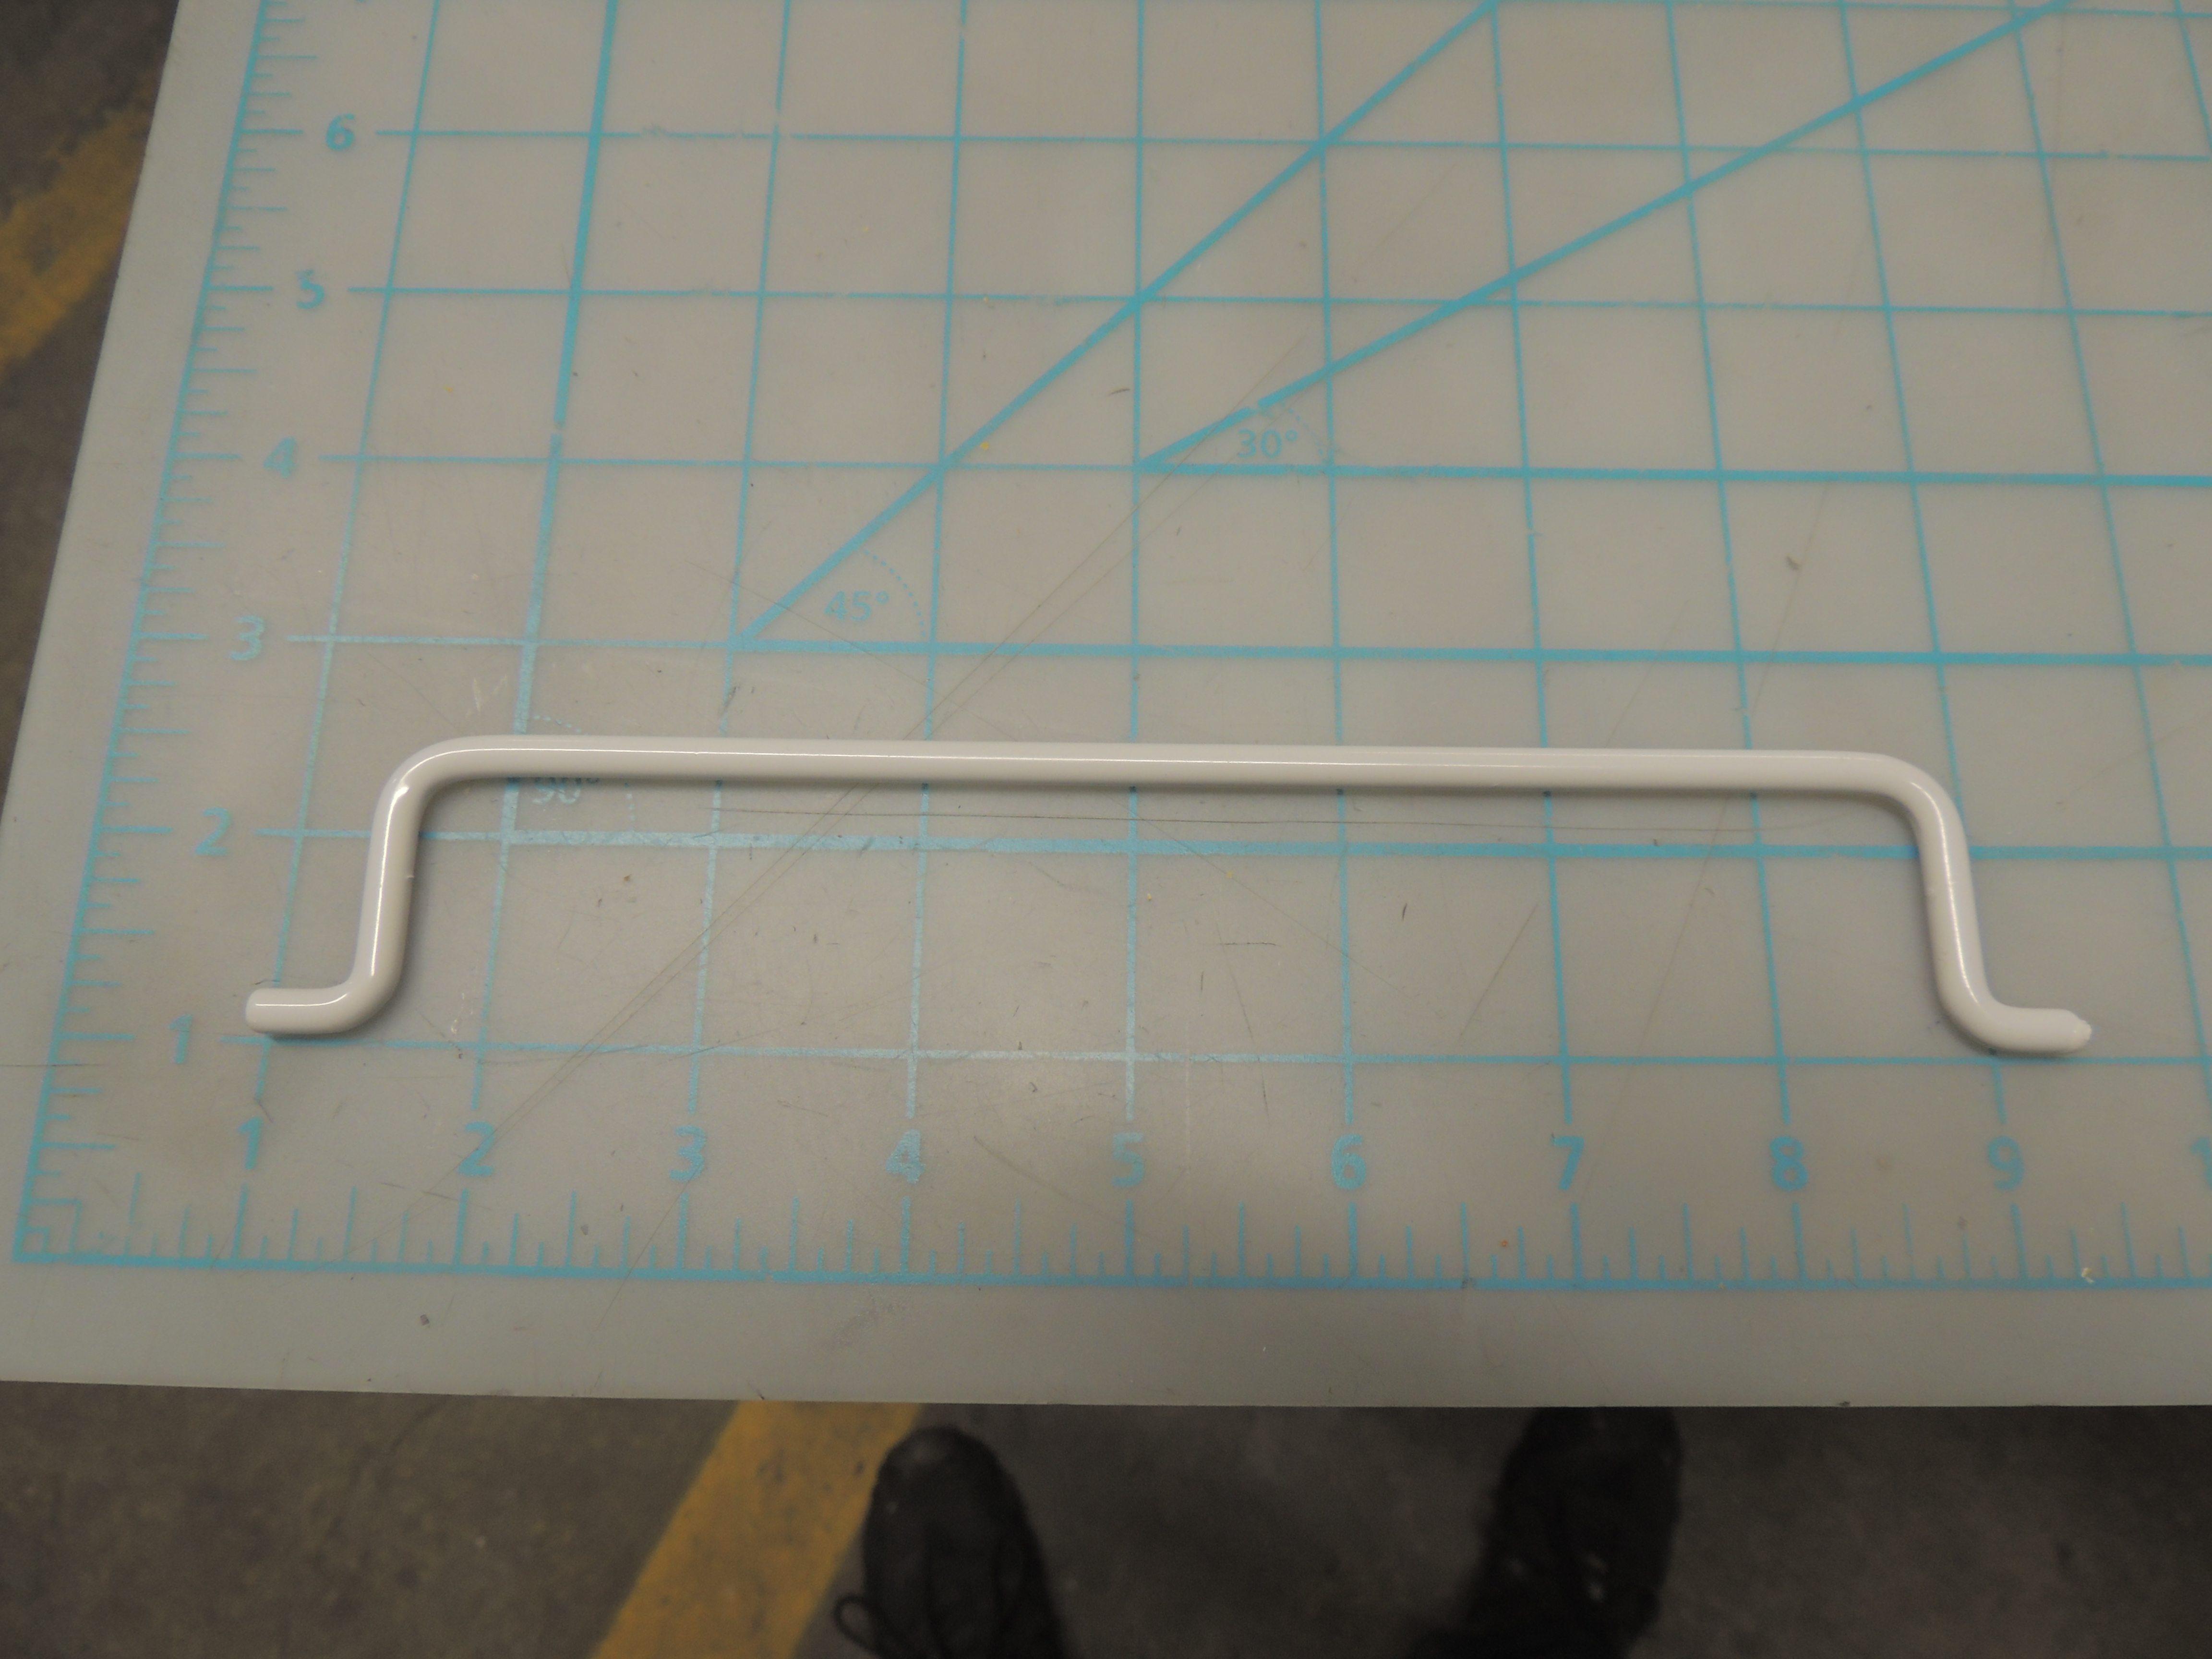 Short curved bar